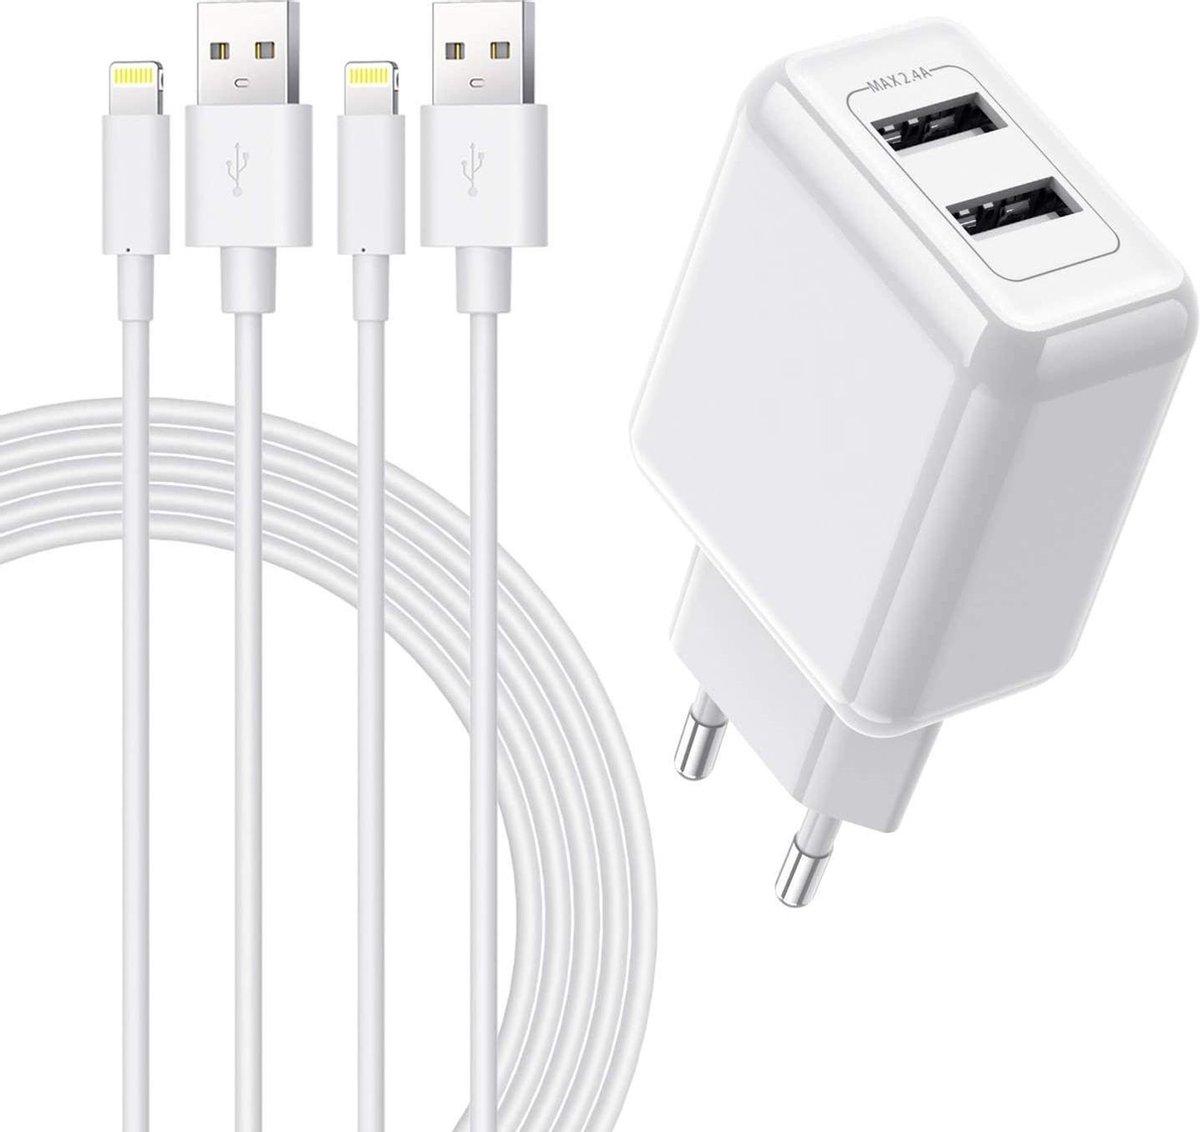 Xssive 12 W 2 poorts iPhone-oplader + 2 stuks 1 meter iPhone-oplaadkabel | [gecertificeerd] USB-voeding en Lightning-kabel voor iPhone SE 2020 XS Max XR X 8 Plus 7 Plus 6 Plus 5s SE iPad Airpods